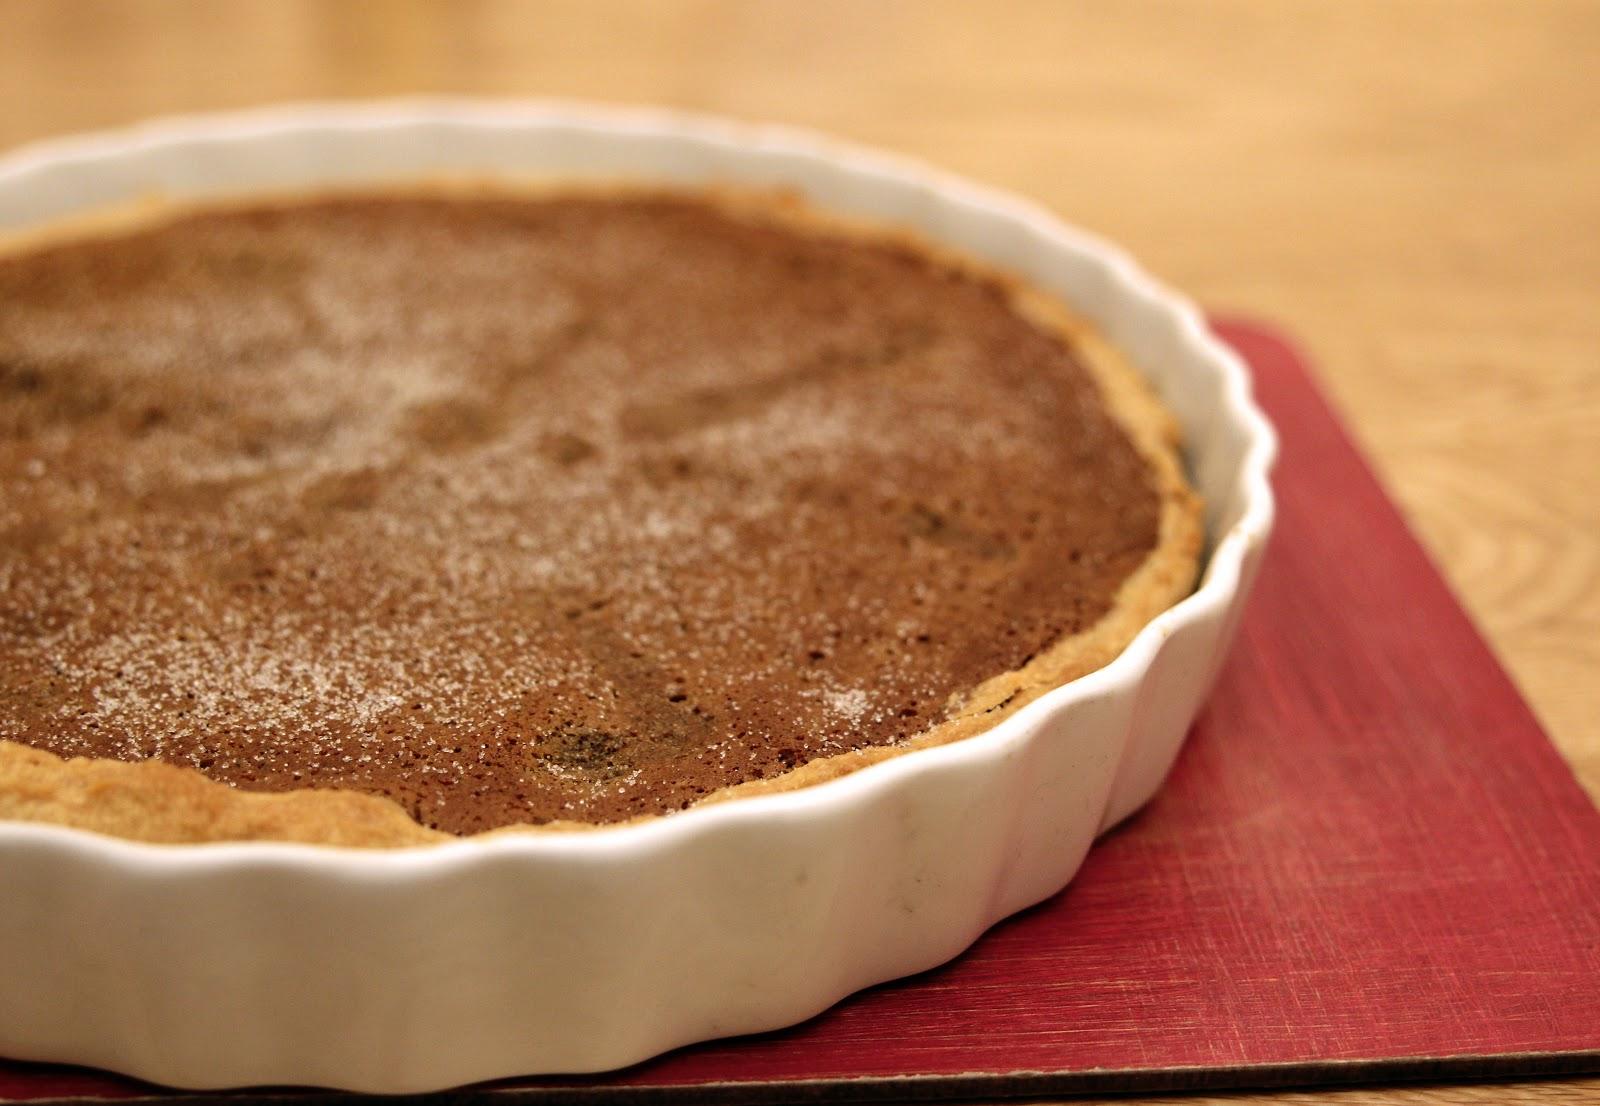 Spiced Pumpkin Pie | Every Word Handwritten: Spiced Pumpkin Pie